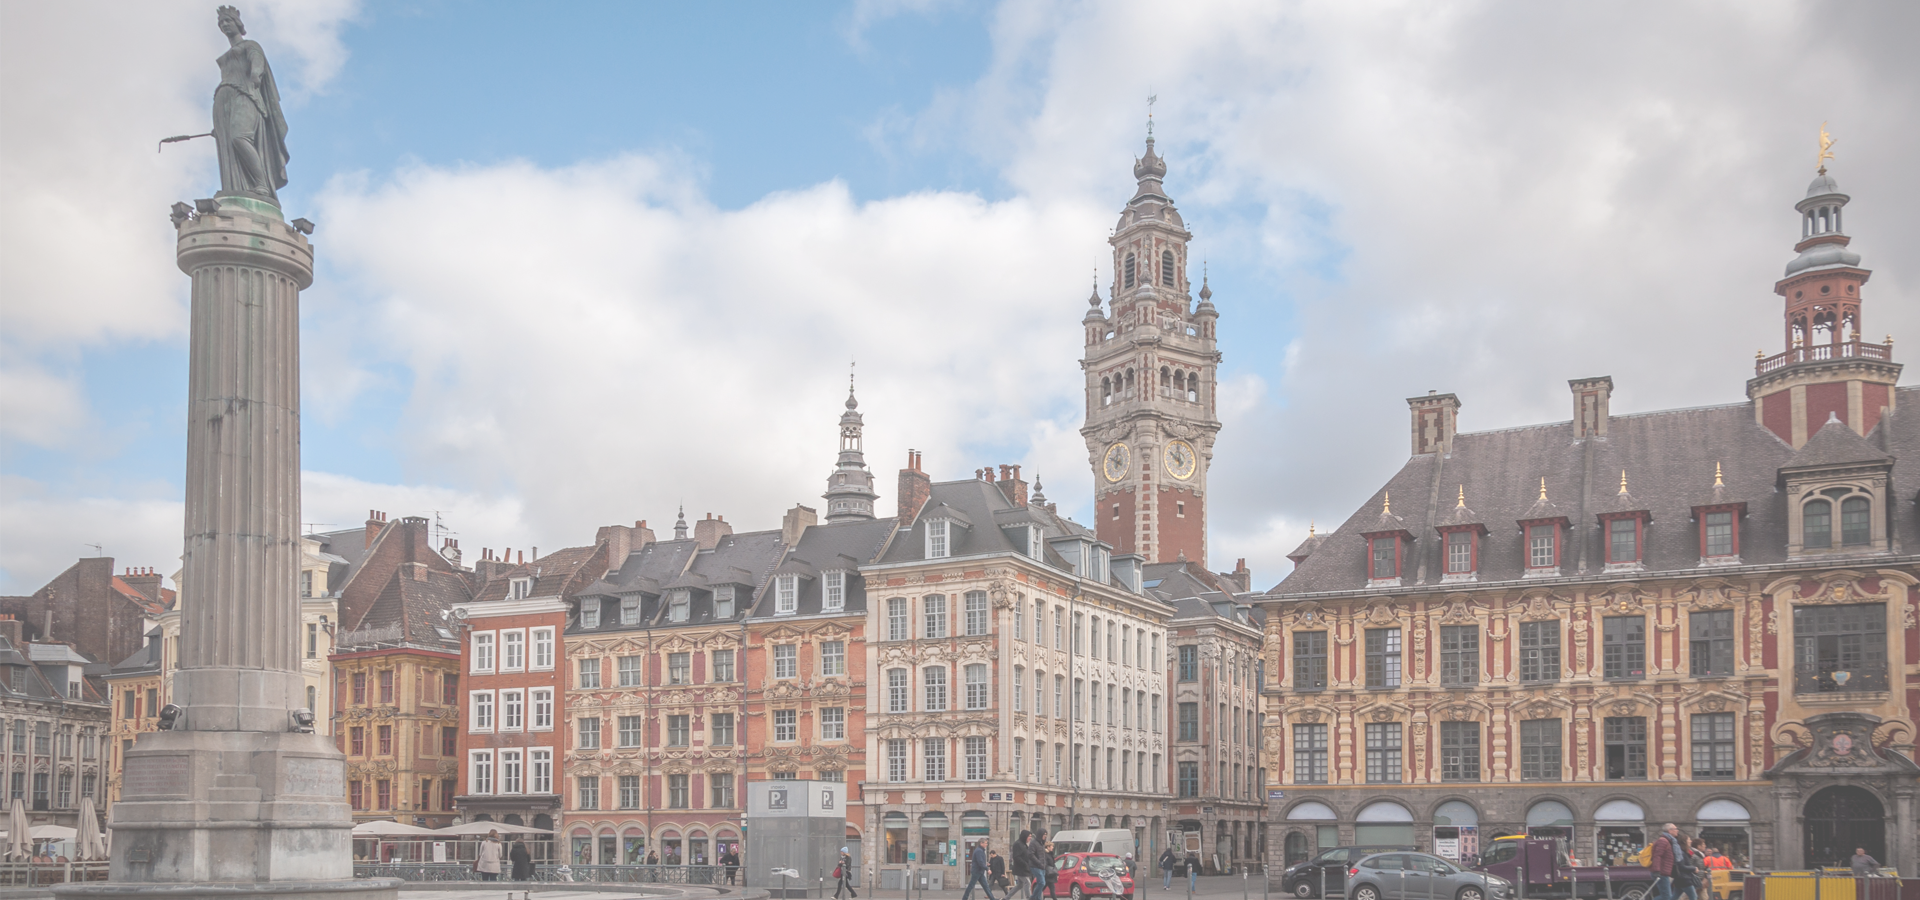 Peer-to-peer advisory in Lille, Département du Nord, Hauts-de-France, France